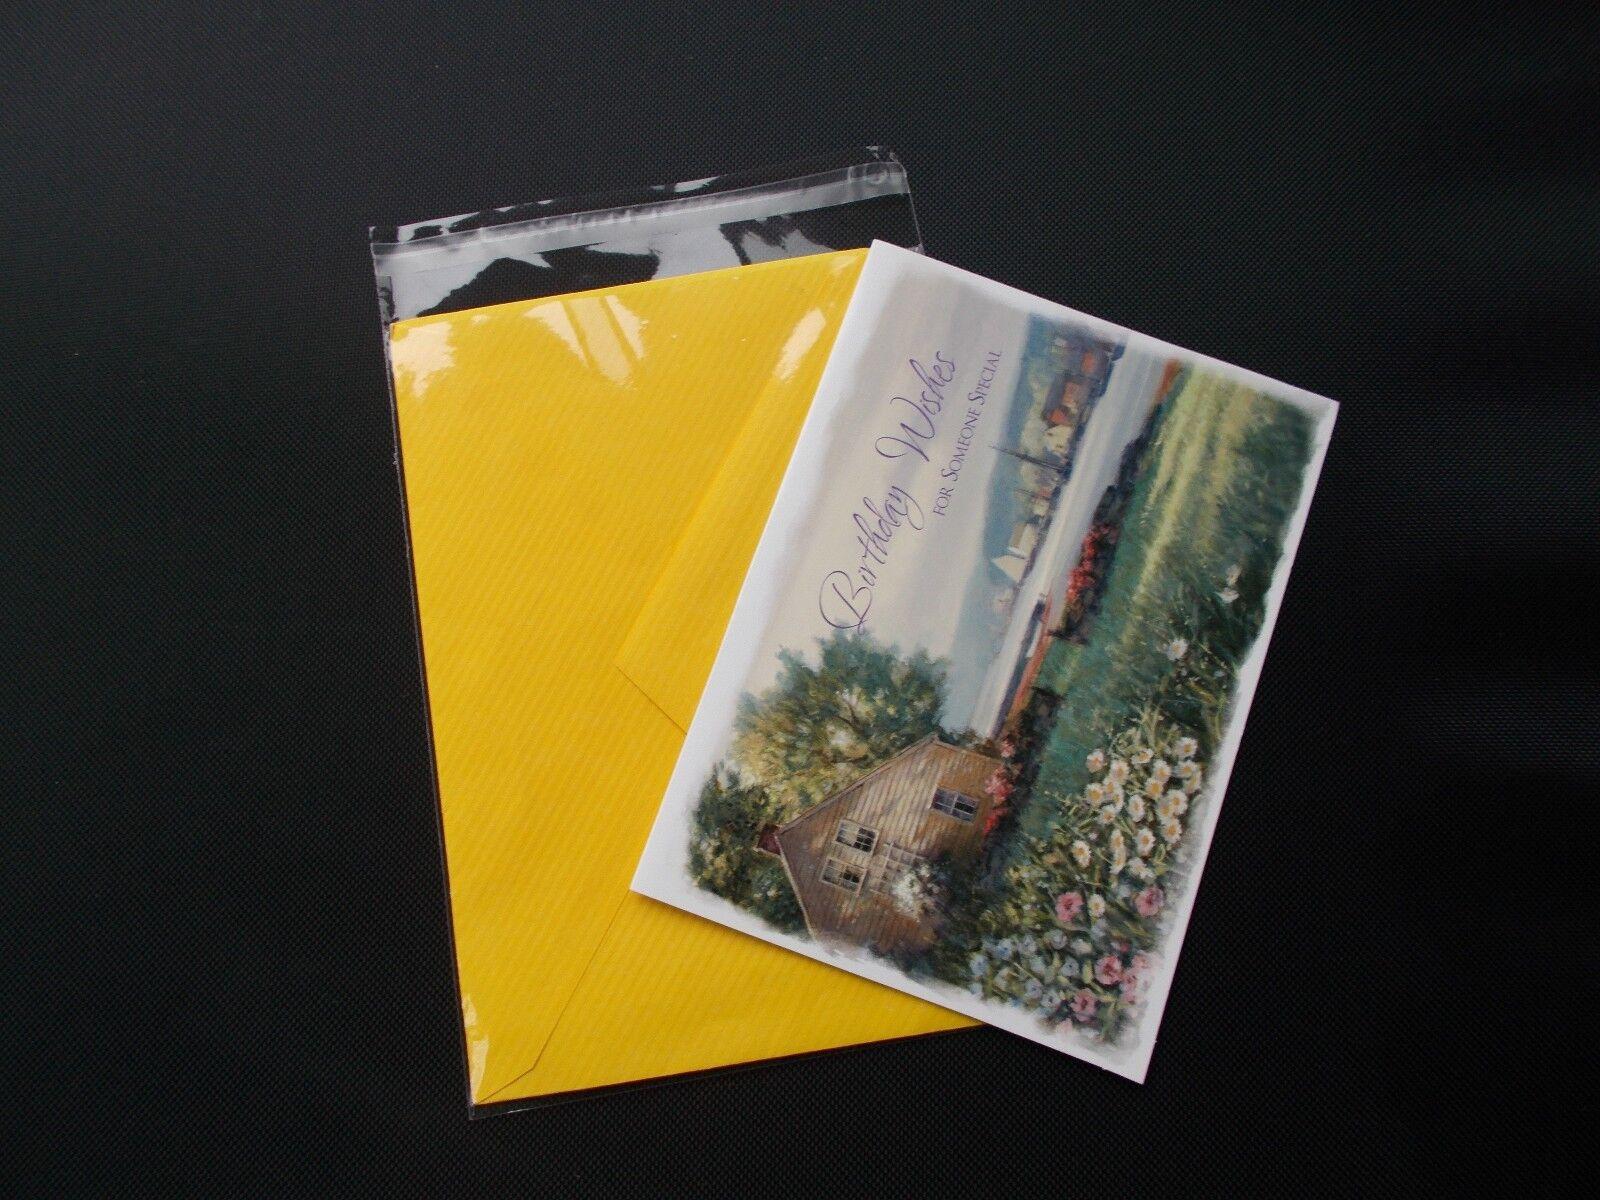 200 Clear Cello Bags 3 1316x 5 316 A1 Card Envelope Resealable